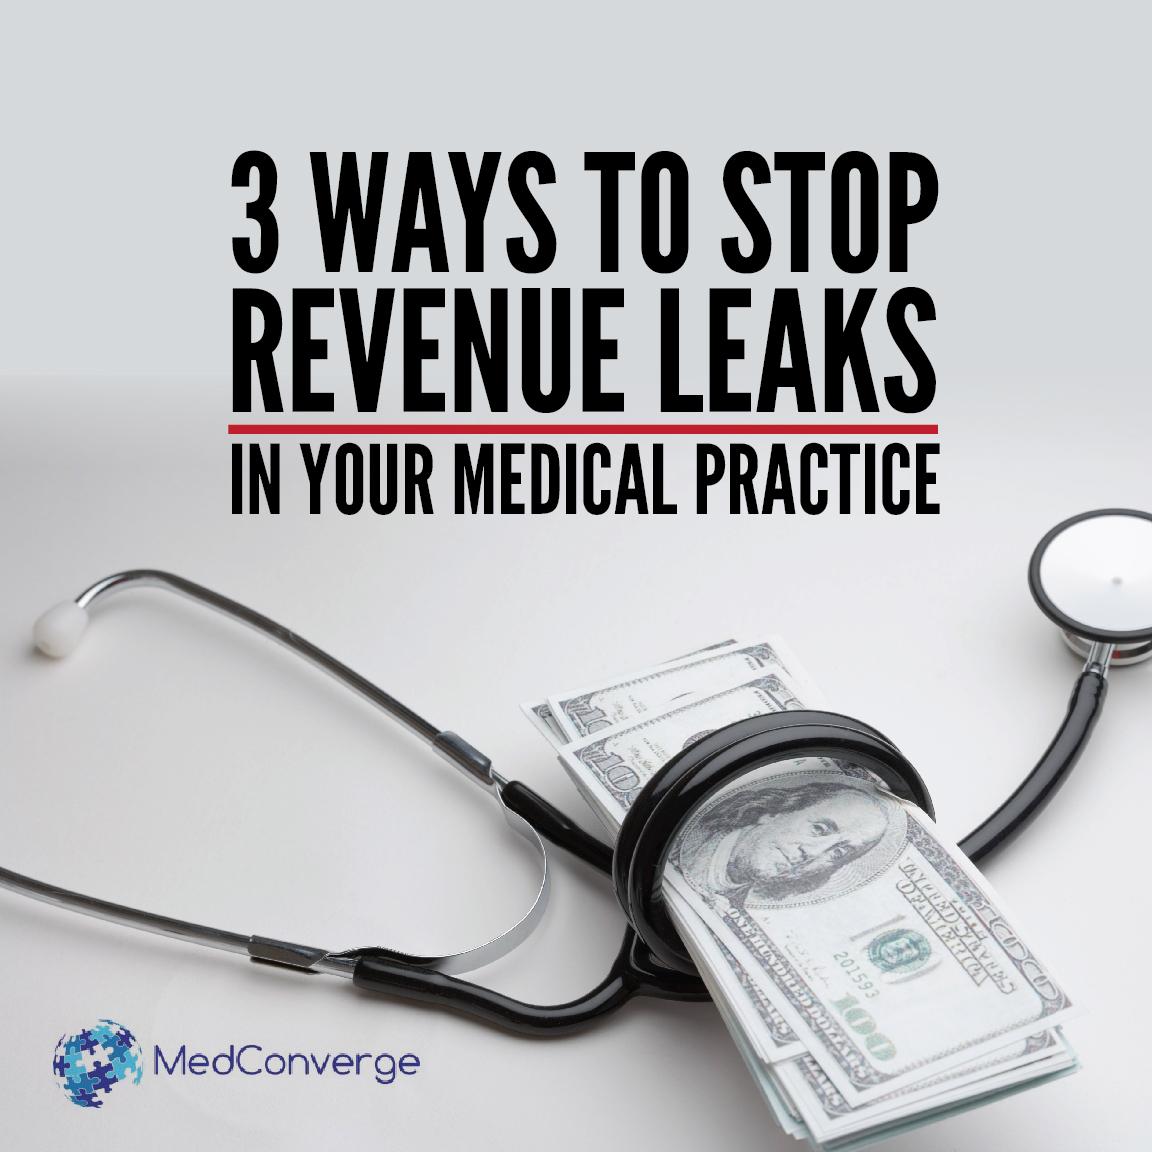 Stop Revenue Leaks